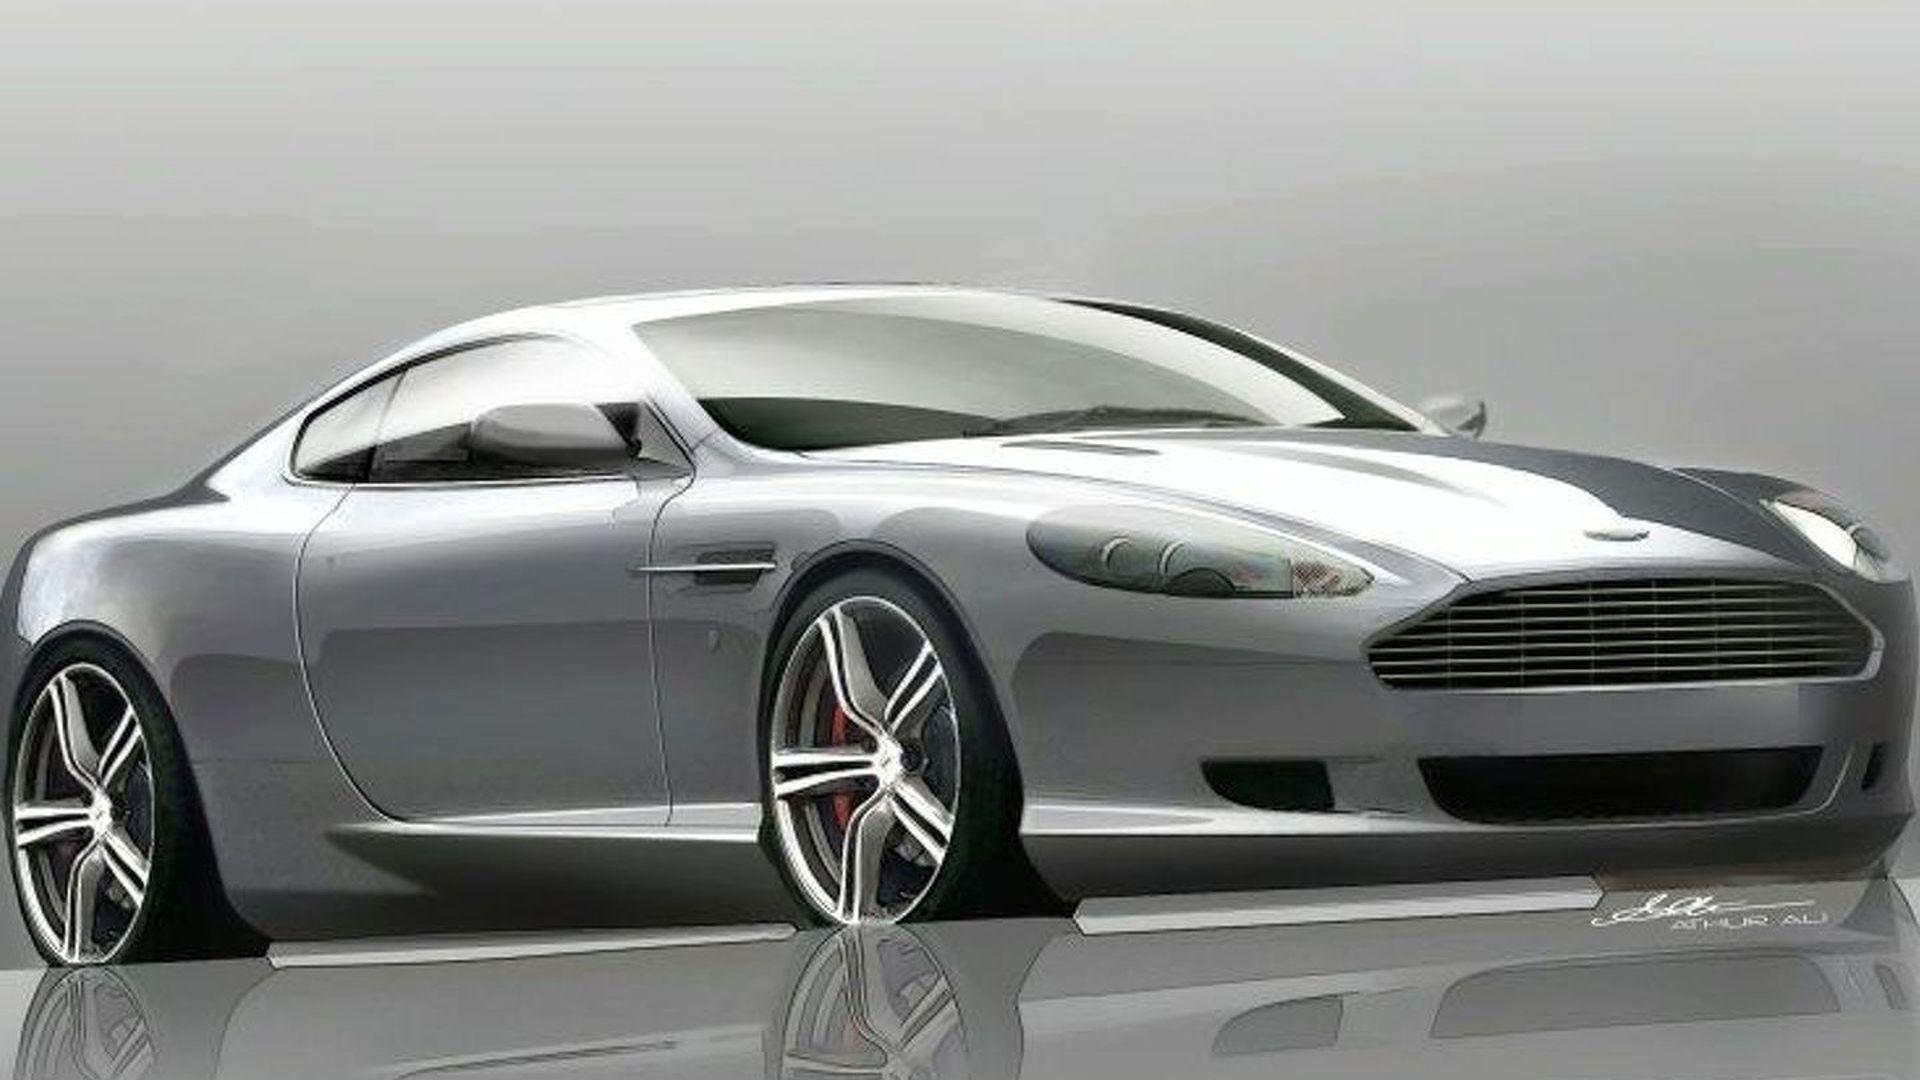 Aston Martin Db9 Lm Special Edition 92411